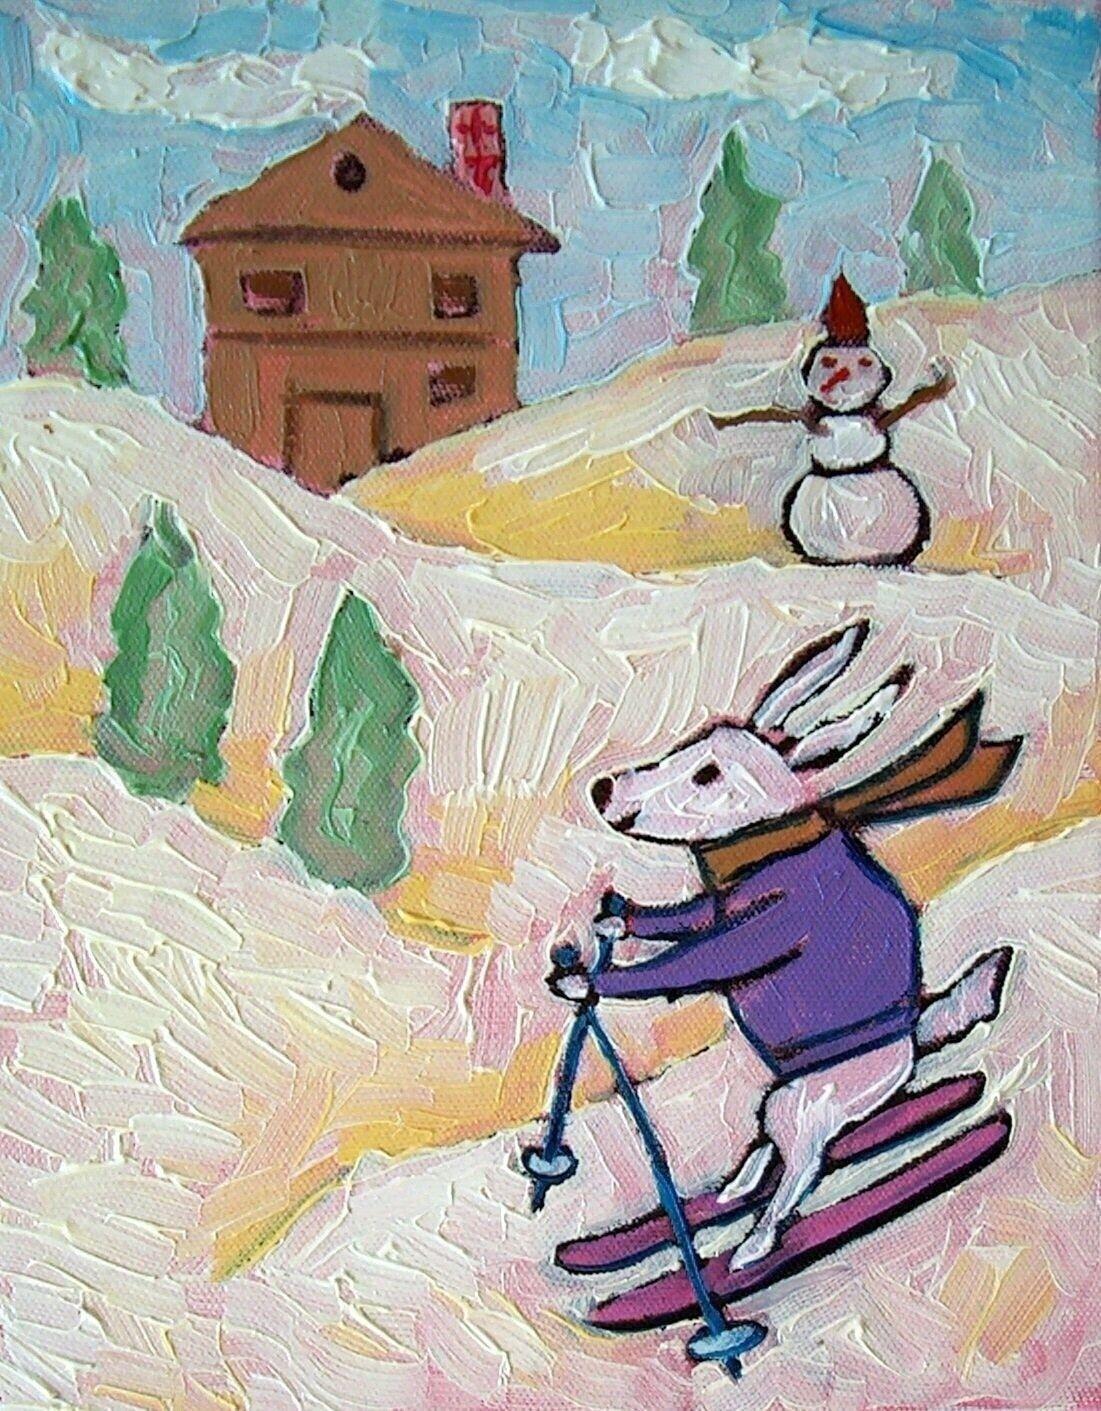 Skate boarding Bunny RABBIT 11x14  art print animals impressionism gift